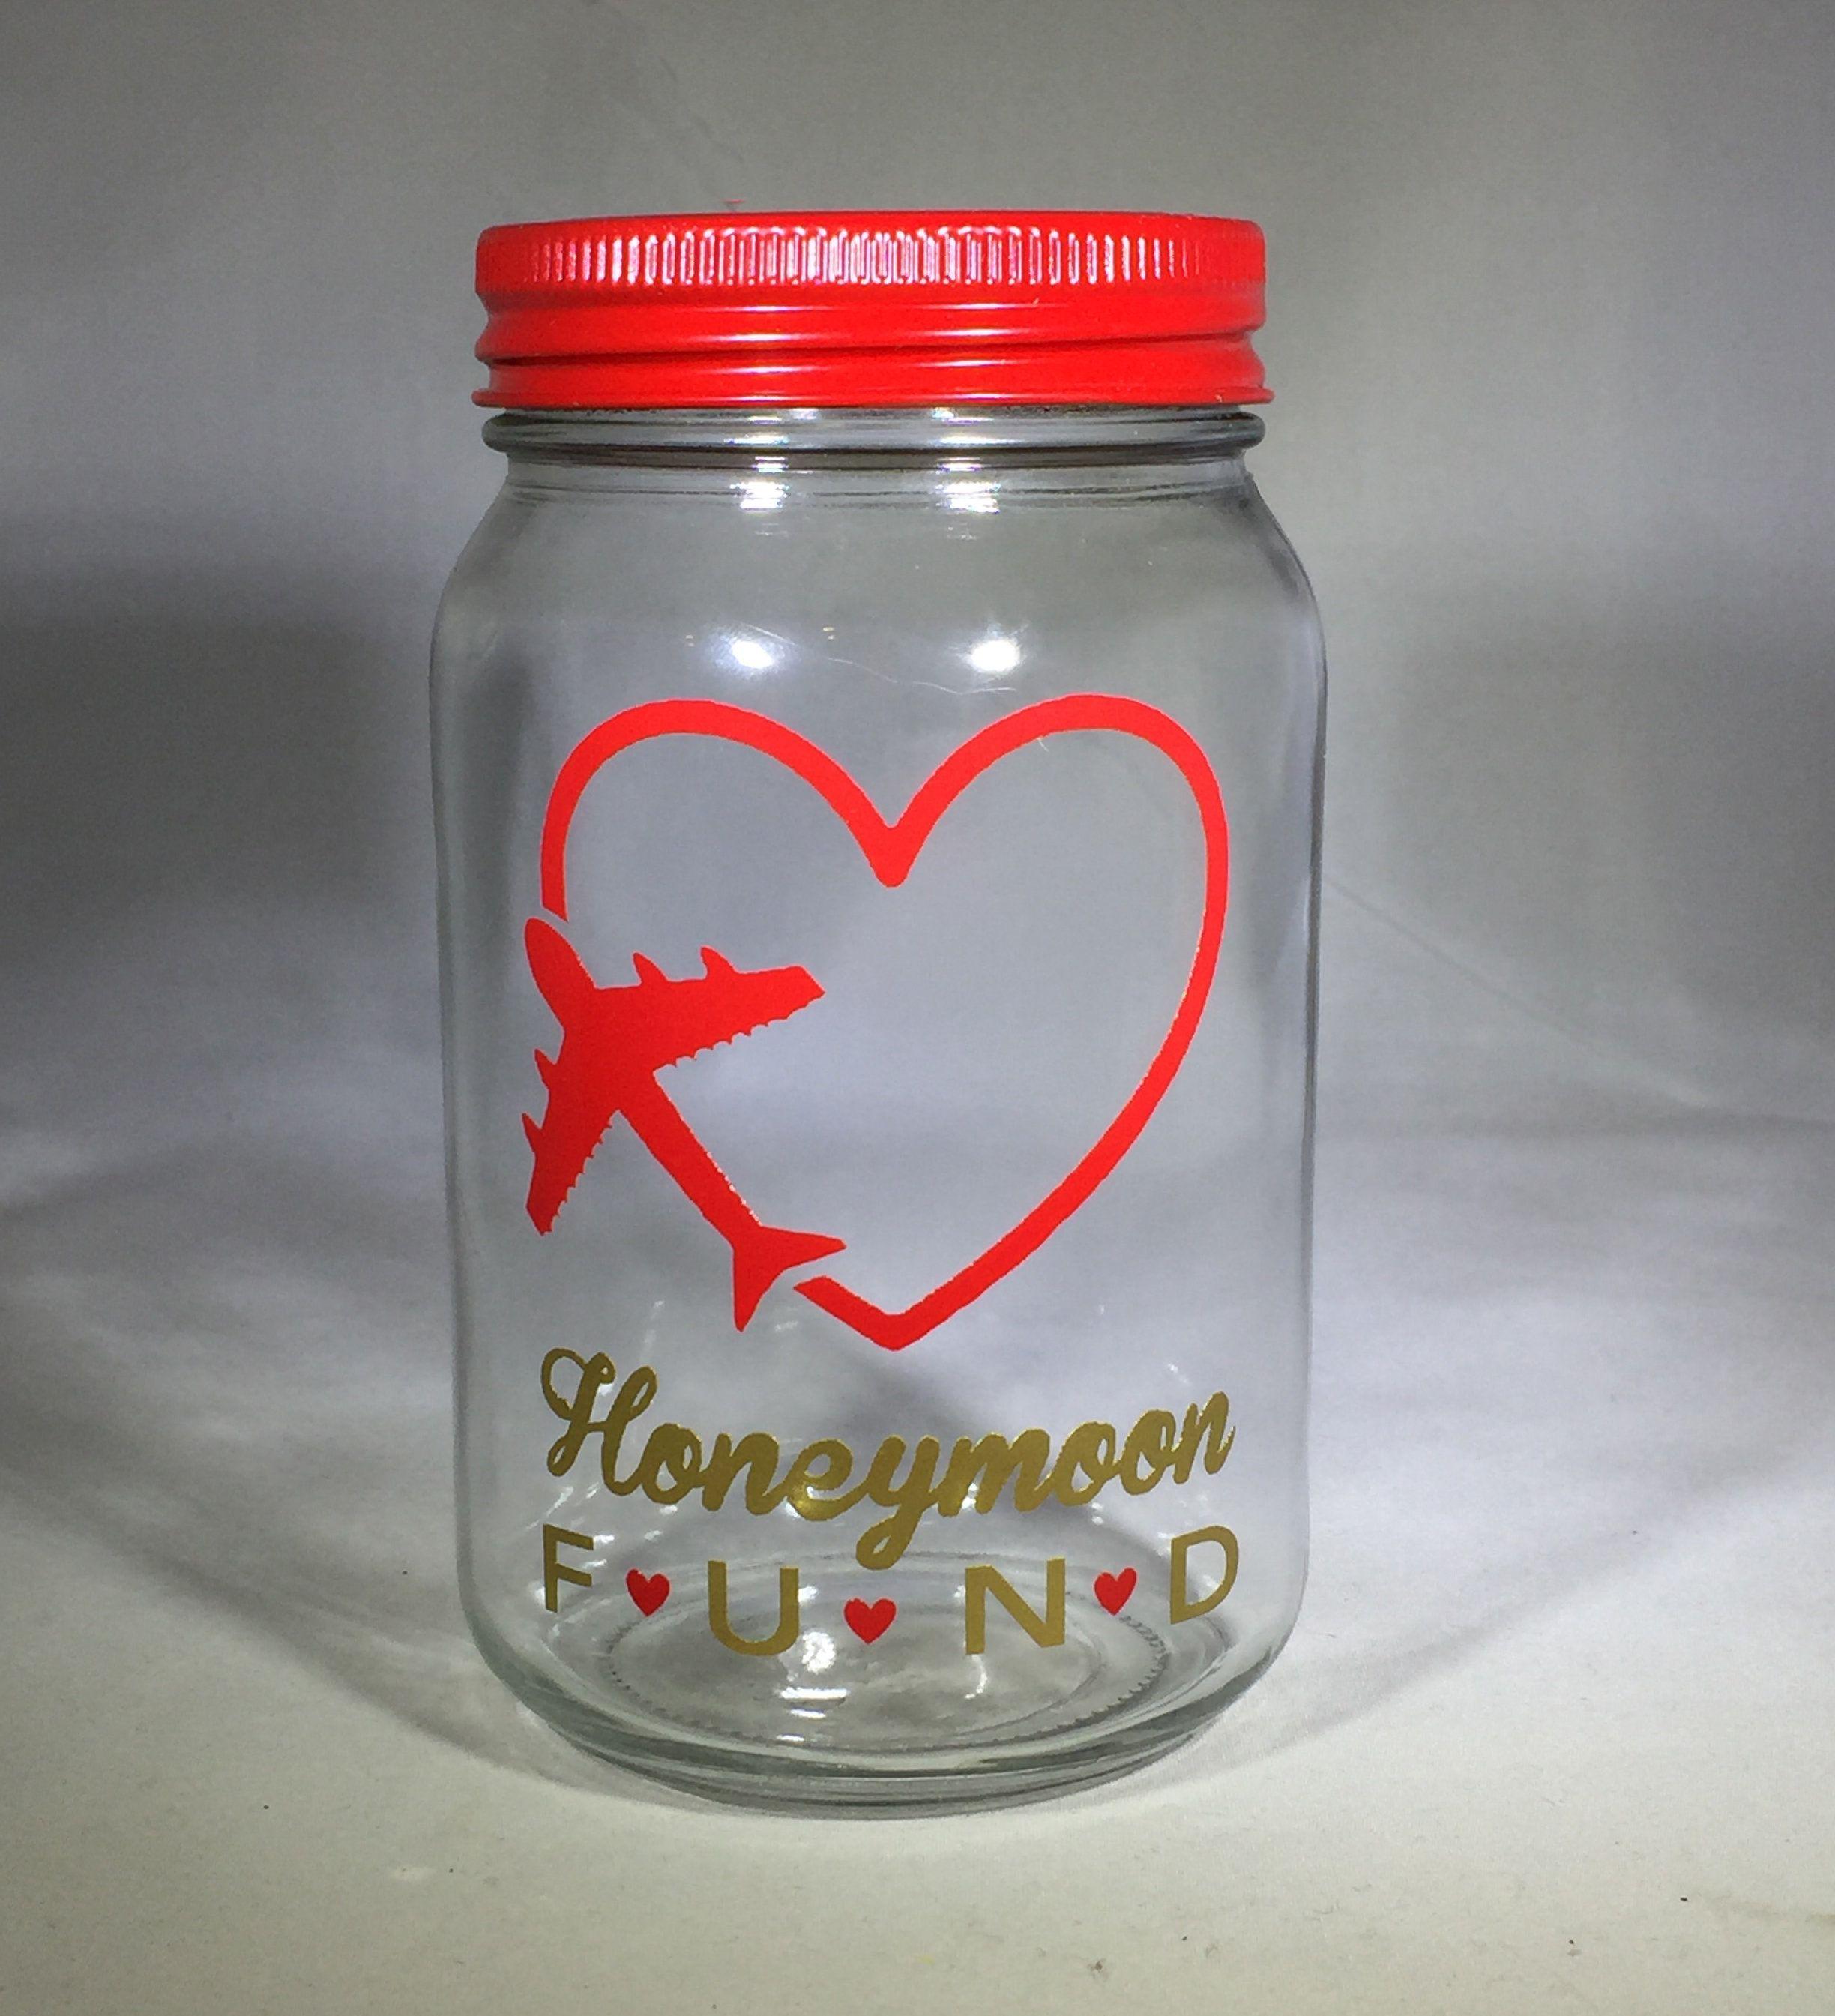 Personalized Mason Jar Honeymoon Bank Honeymoon Fund Bank Money Jar Mason Jar Fund Glass Coin Bank Personalized Mason Jars Mason Jar Bank Money Jars